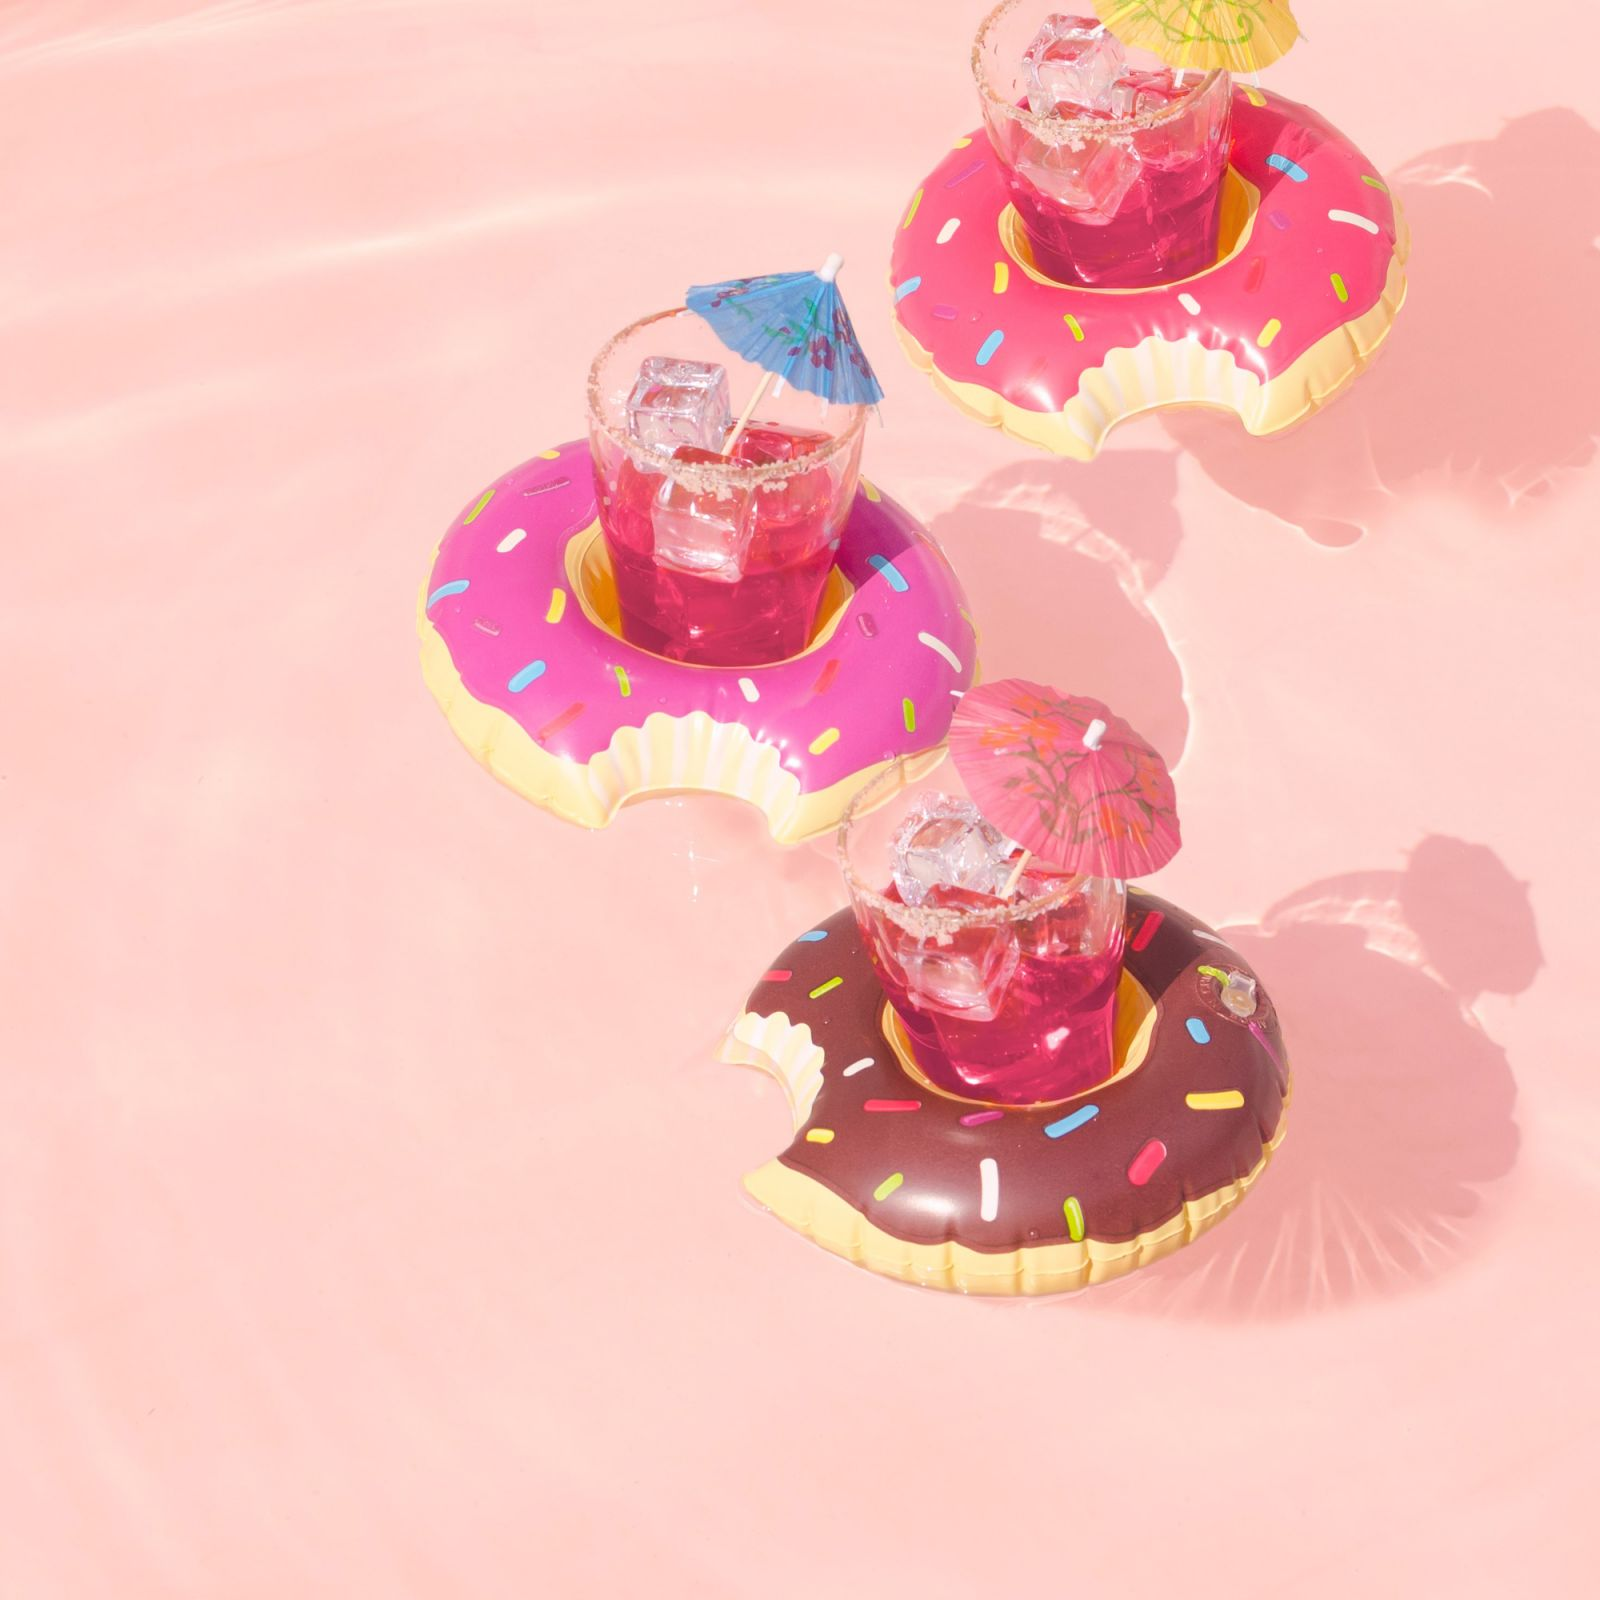 porte-boissons donut gonflable bigmouth